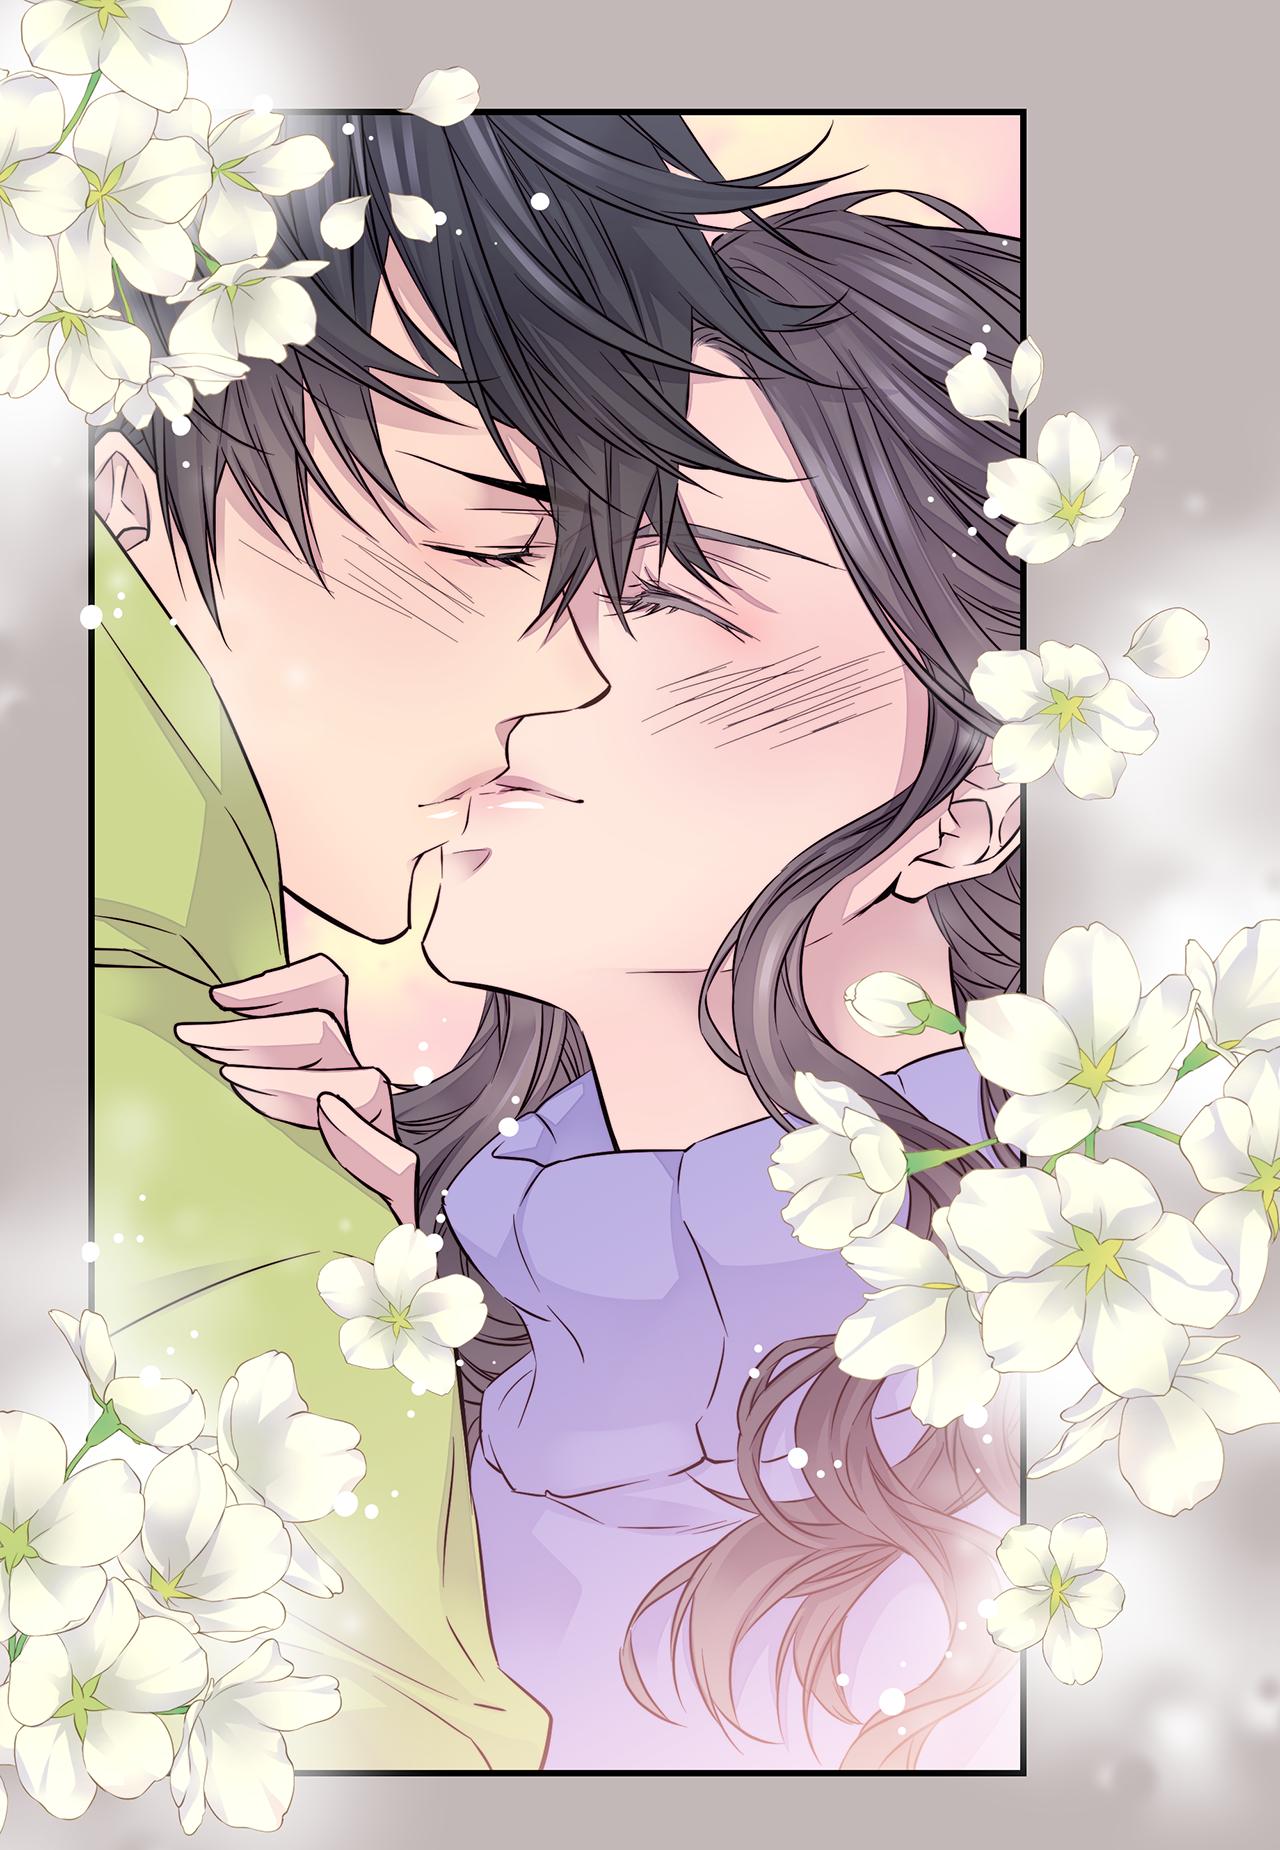 FieryEnemies Tappytoon Manhwa Manga Anime Webtoon